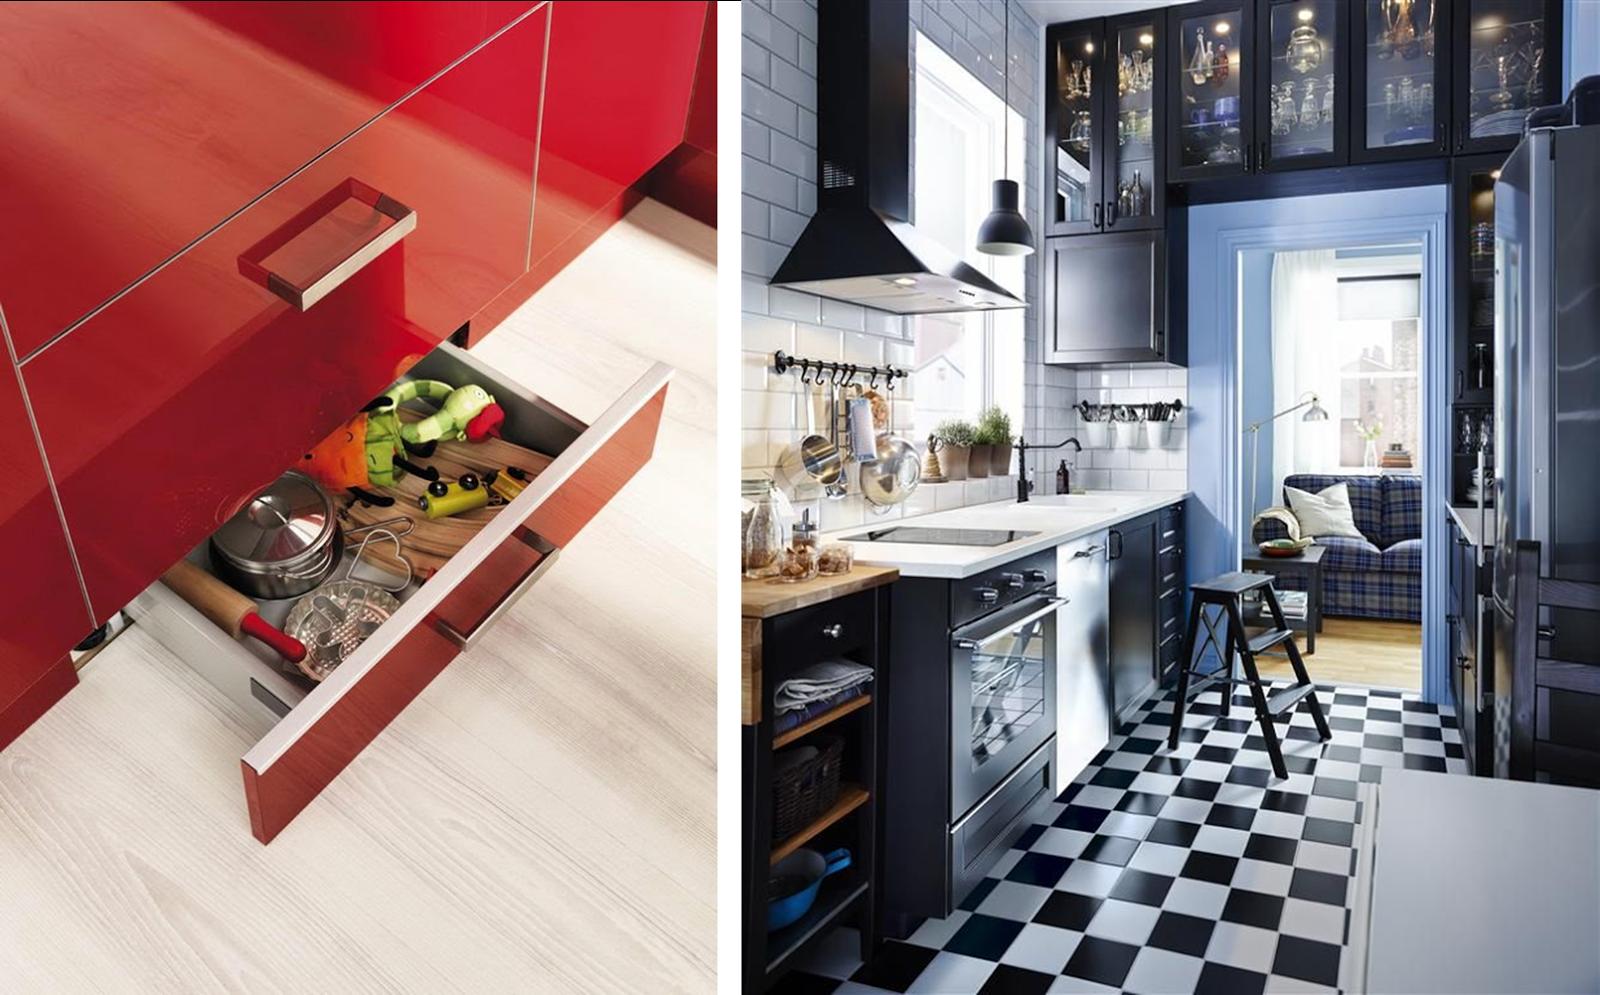 Muebles para cocinas peque as fotos for Ideas de muebles para cocinas pequenas